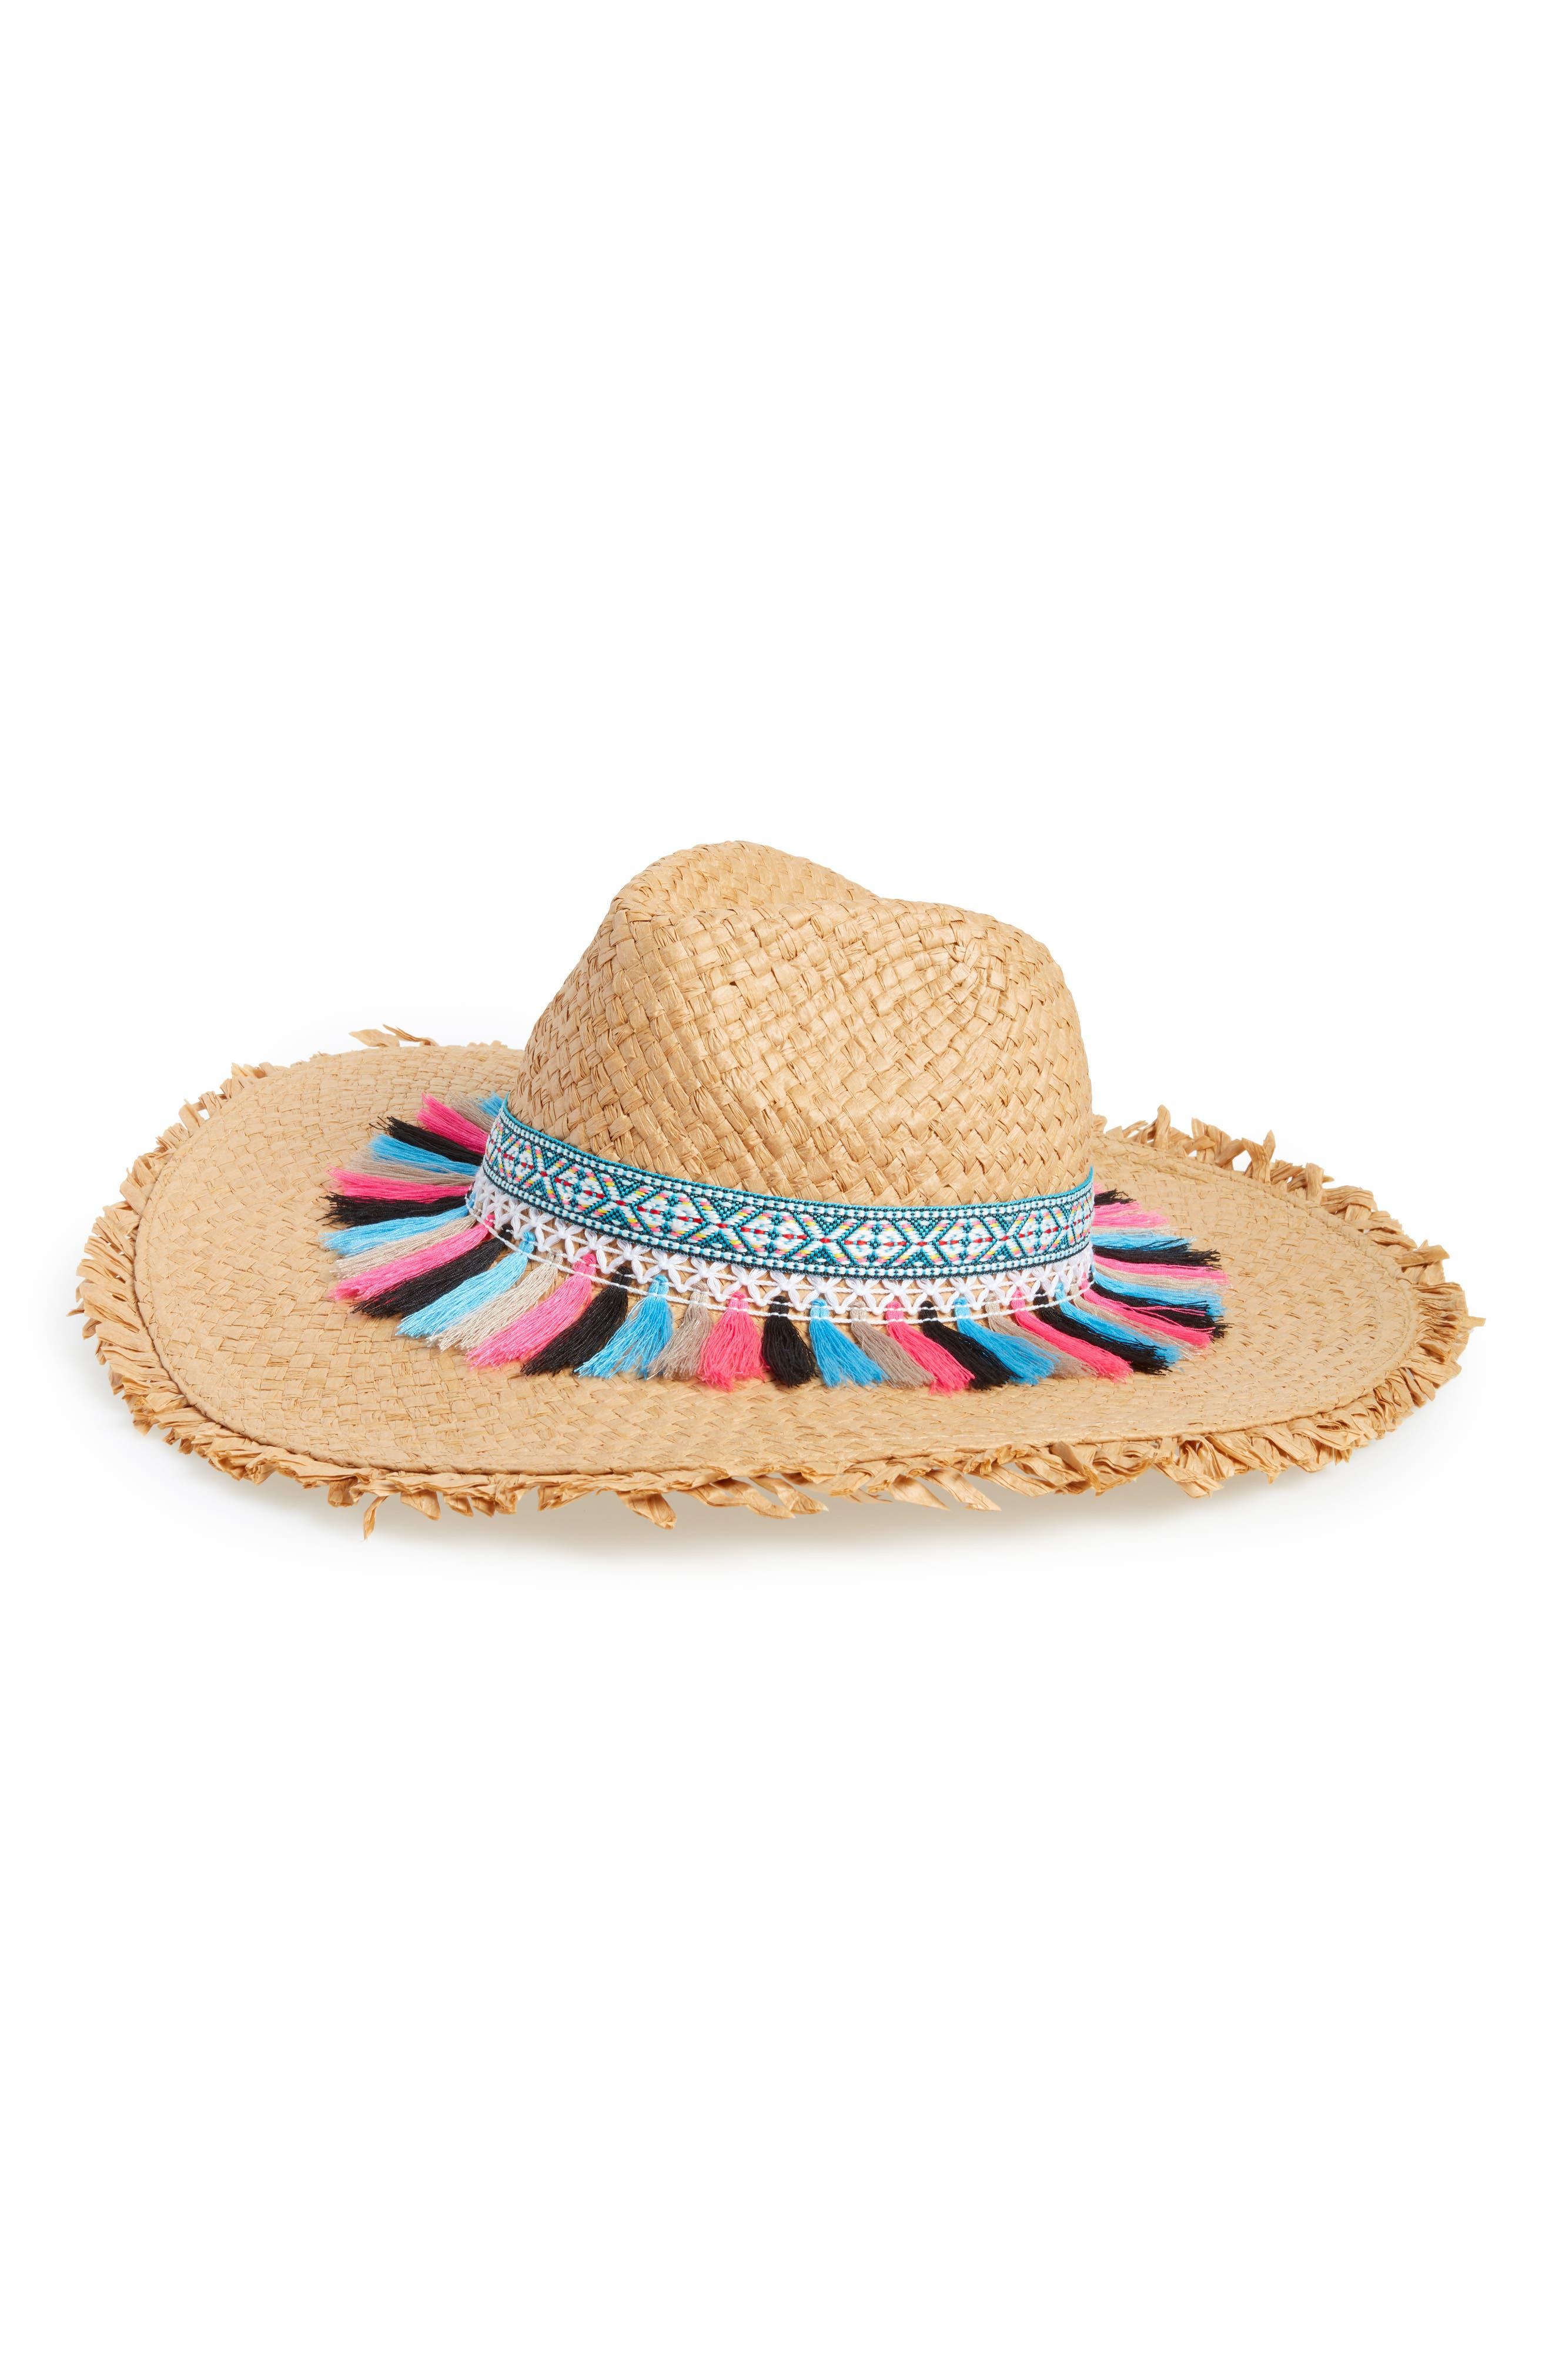 Festival Flair Panama Hat,                             Main thumbnail 1, color,                             Pastel